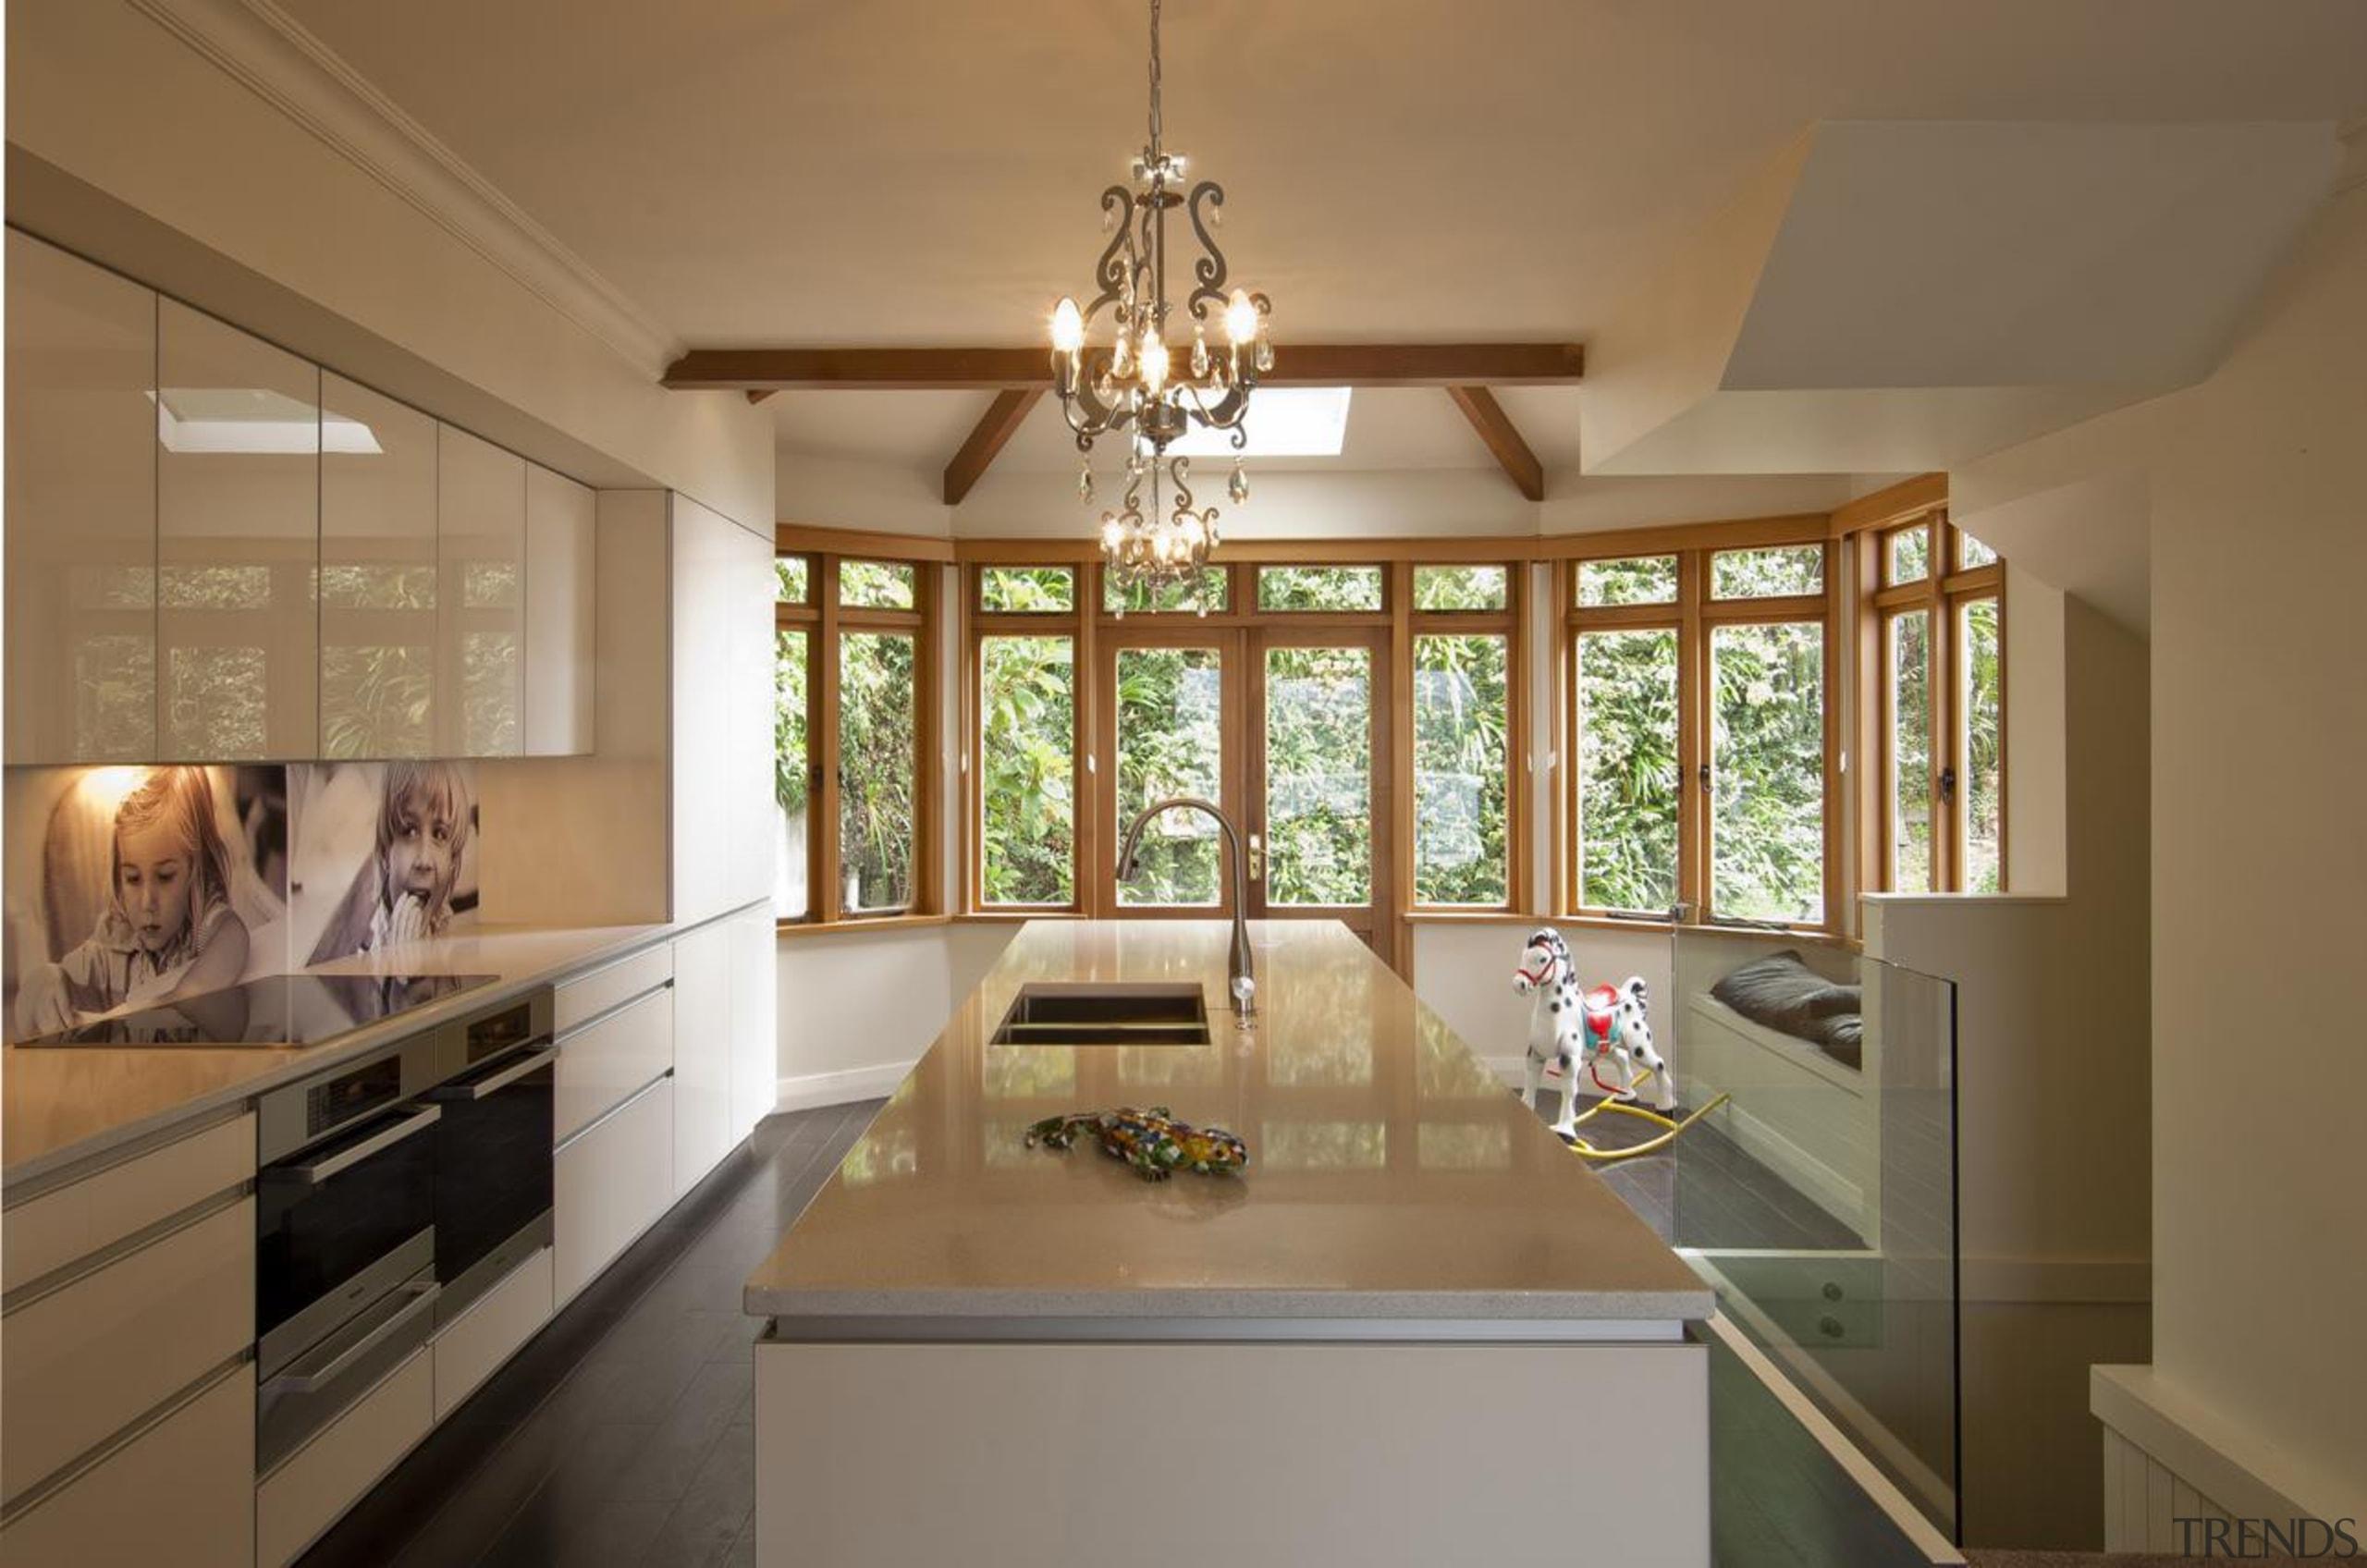 Hataitai Kitchen - Hataitai Kitchen - ceiling   ceiling, countertop, cuisine classique, estate, home, interior design, kitchen, real estate, room, window, brown